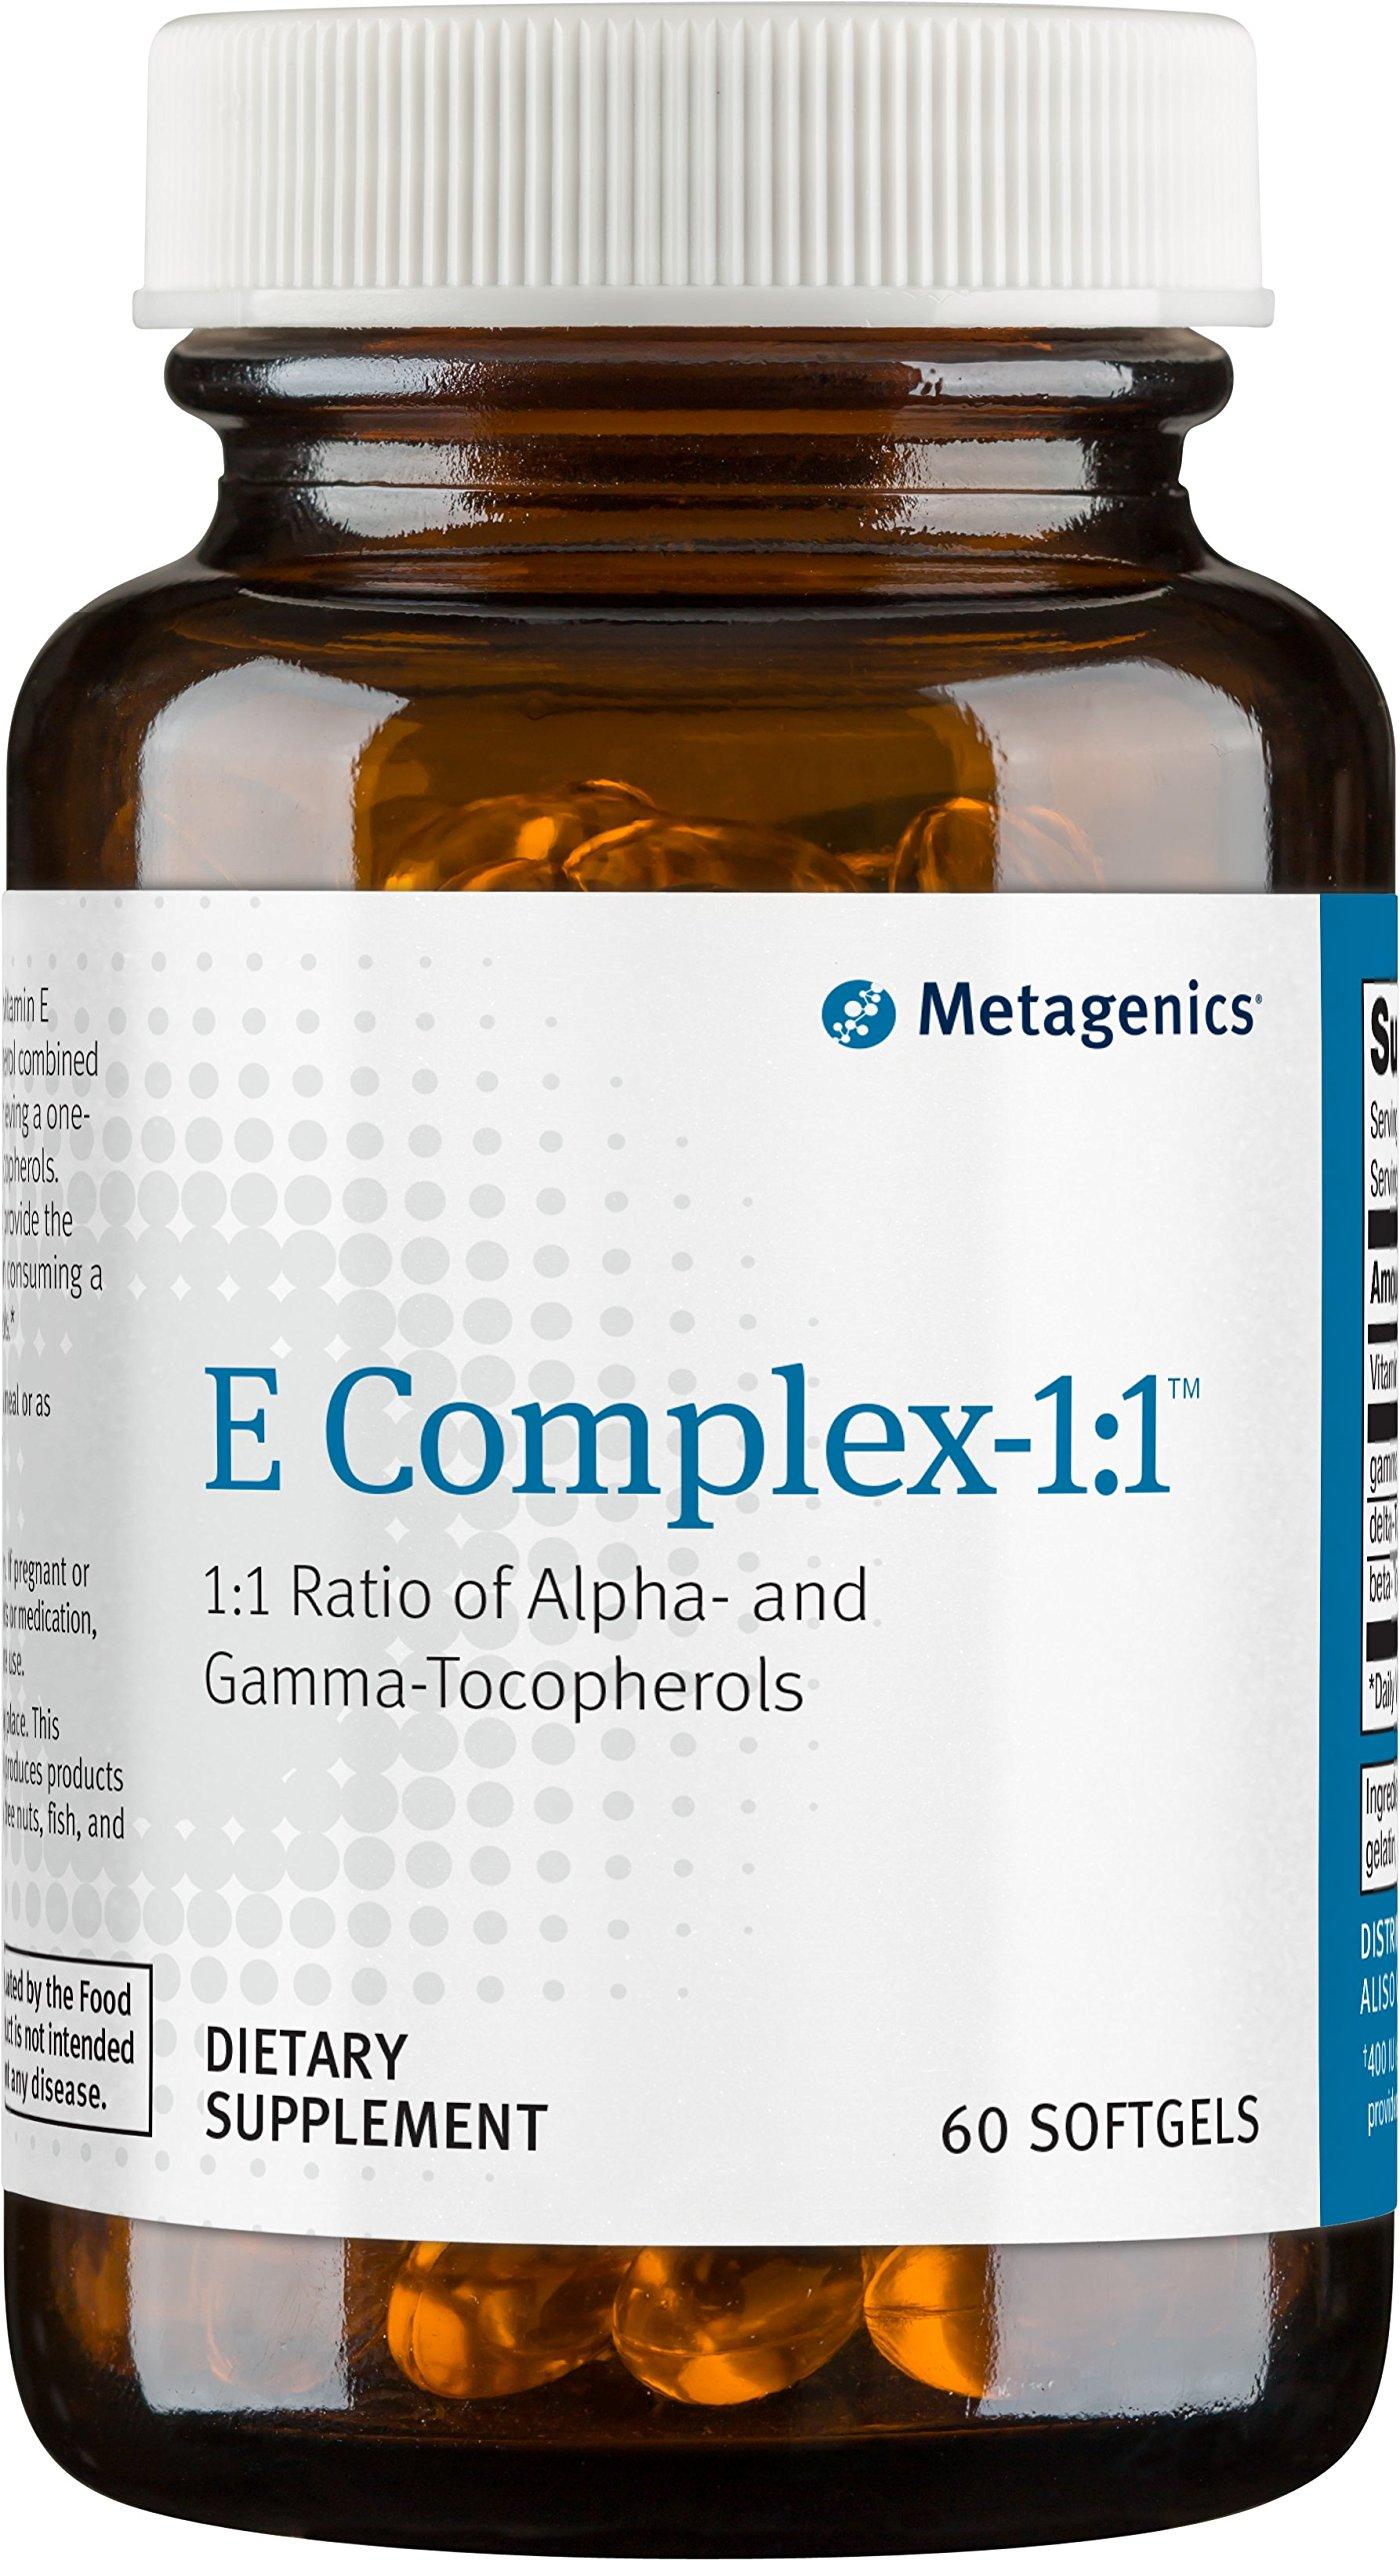 Metagenics - E Complex-1:1, 60 Count